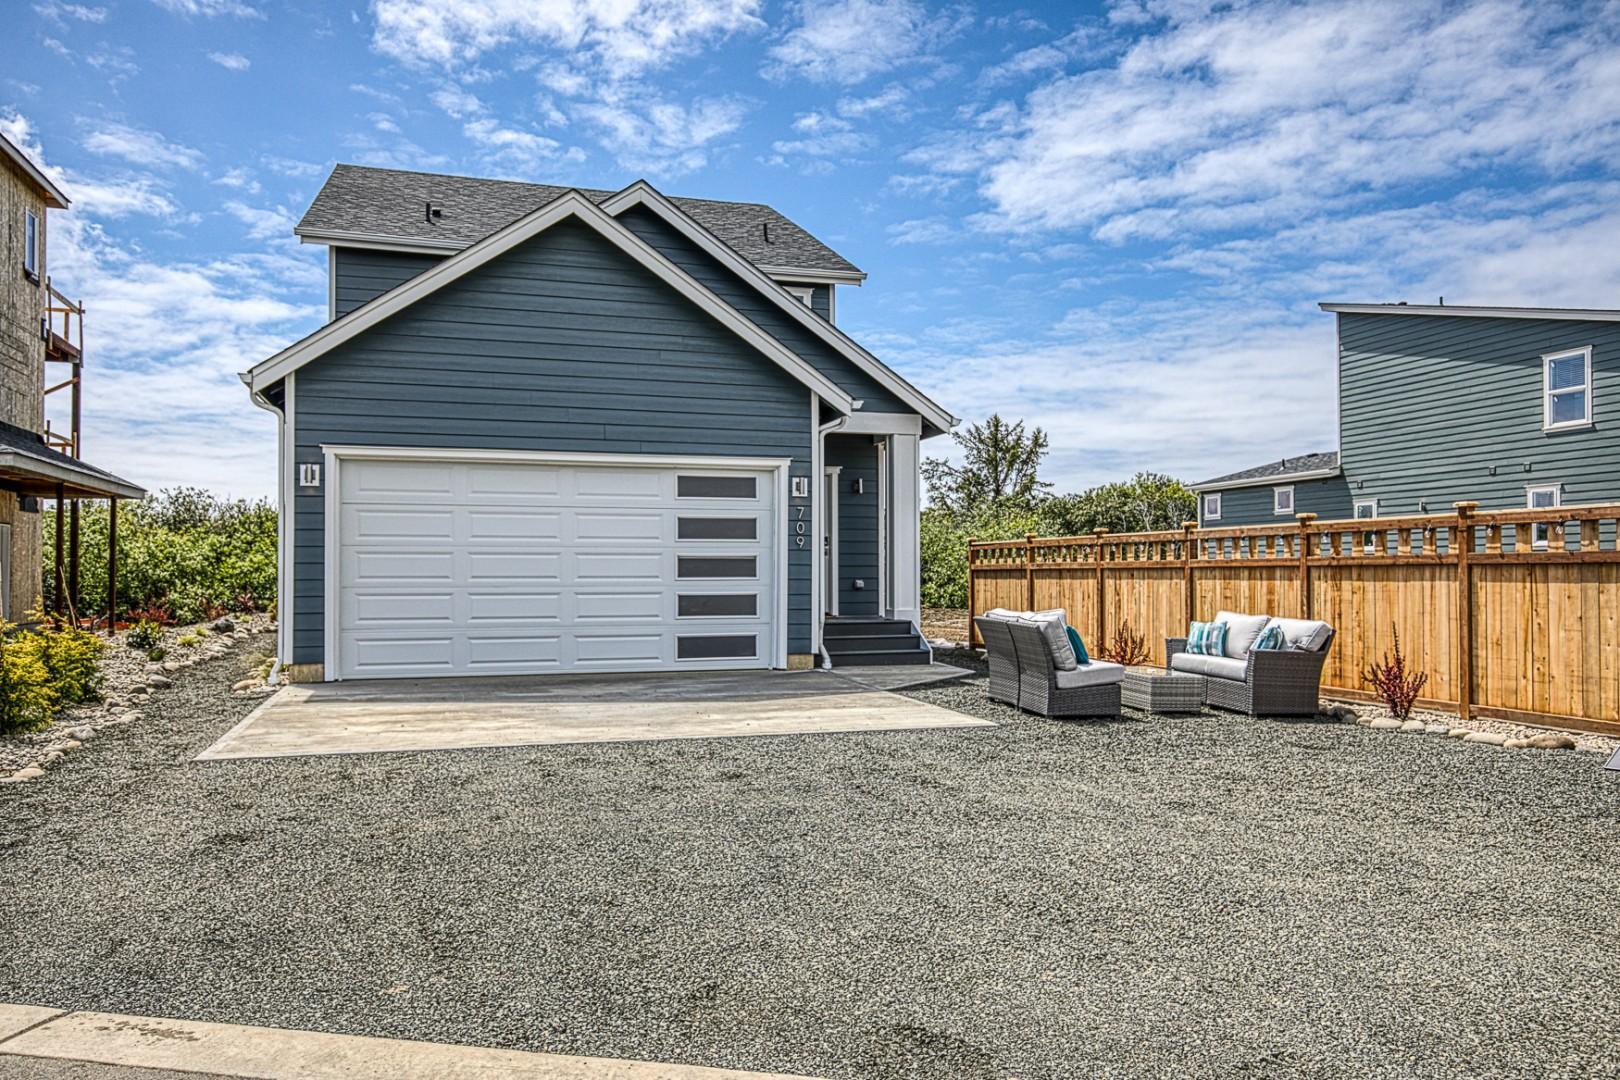 054 Barefoot Beach House